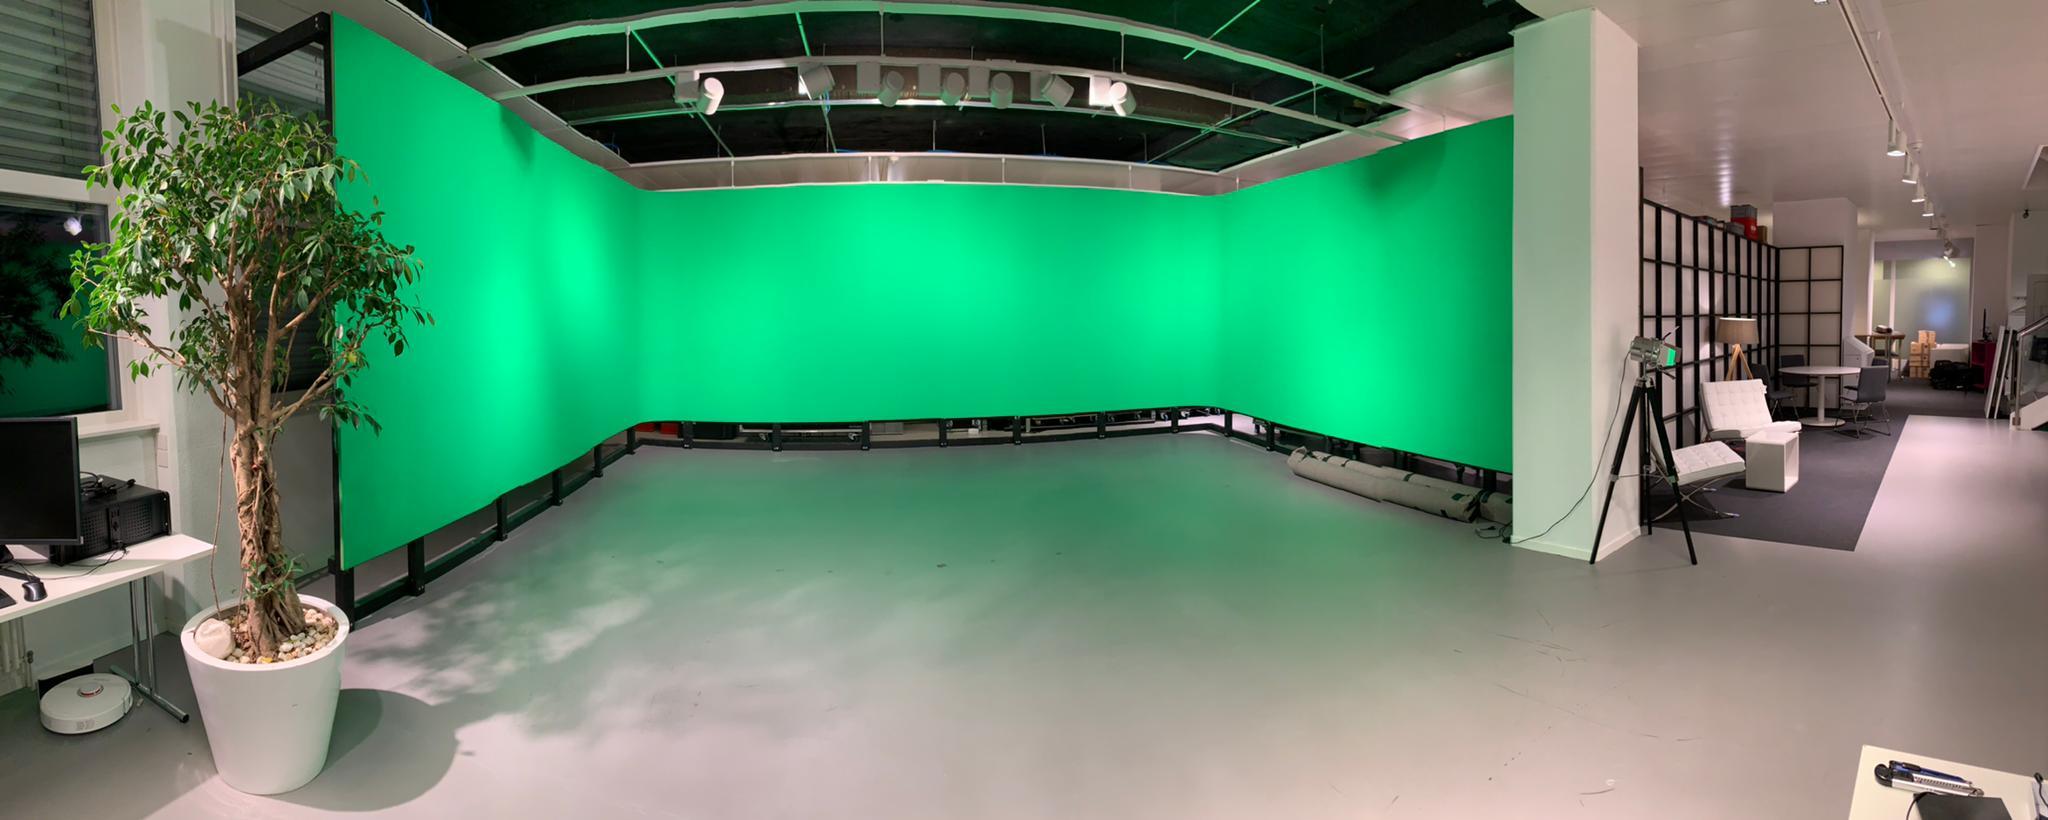 Studio fond vert cyclorama